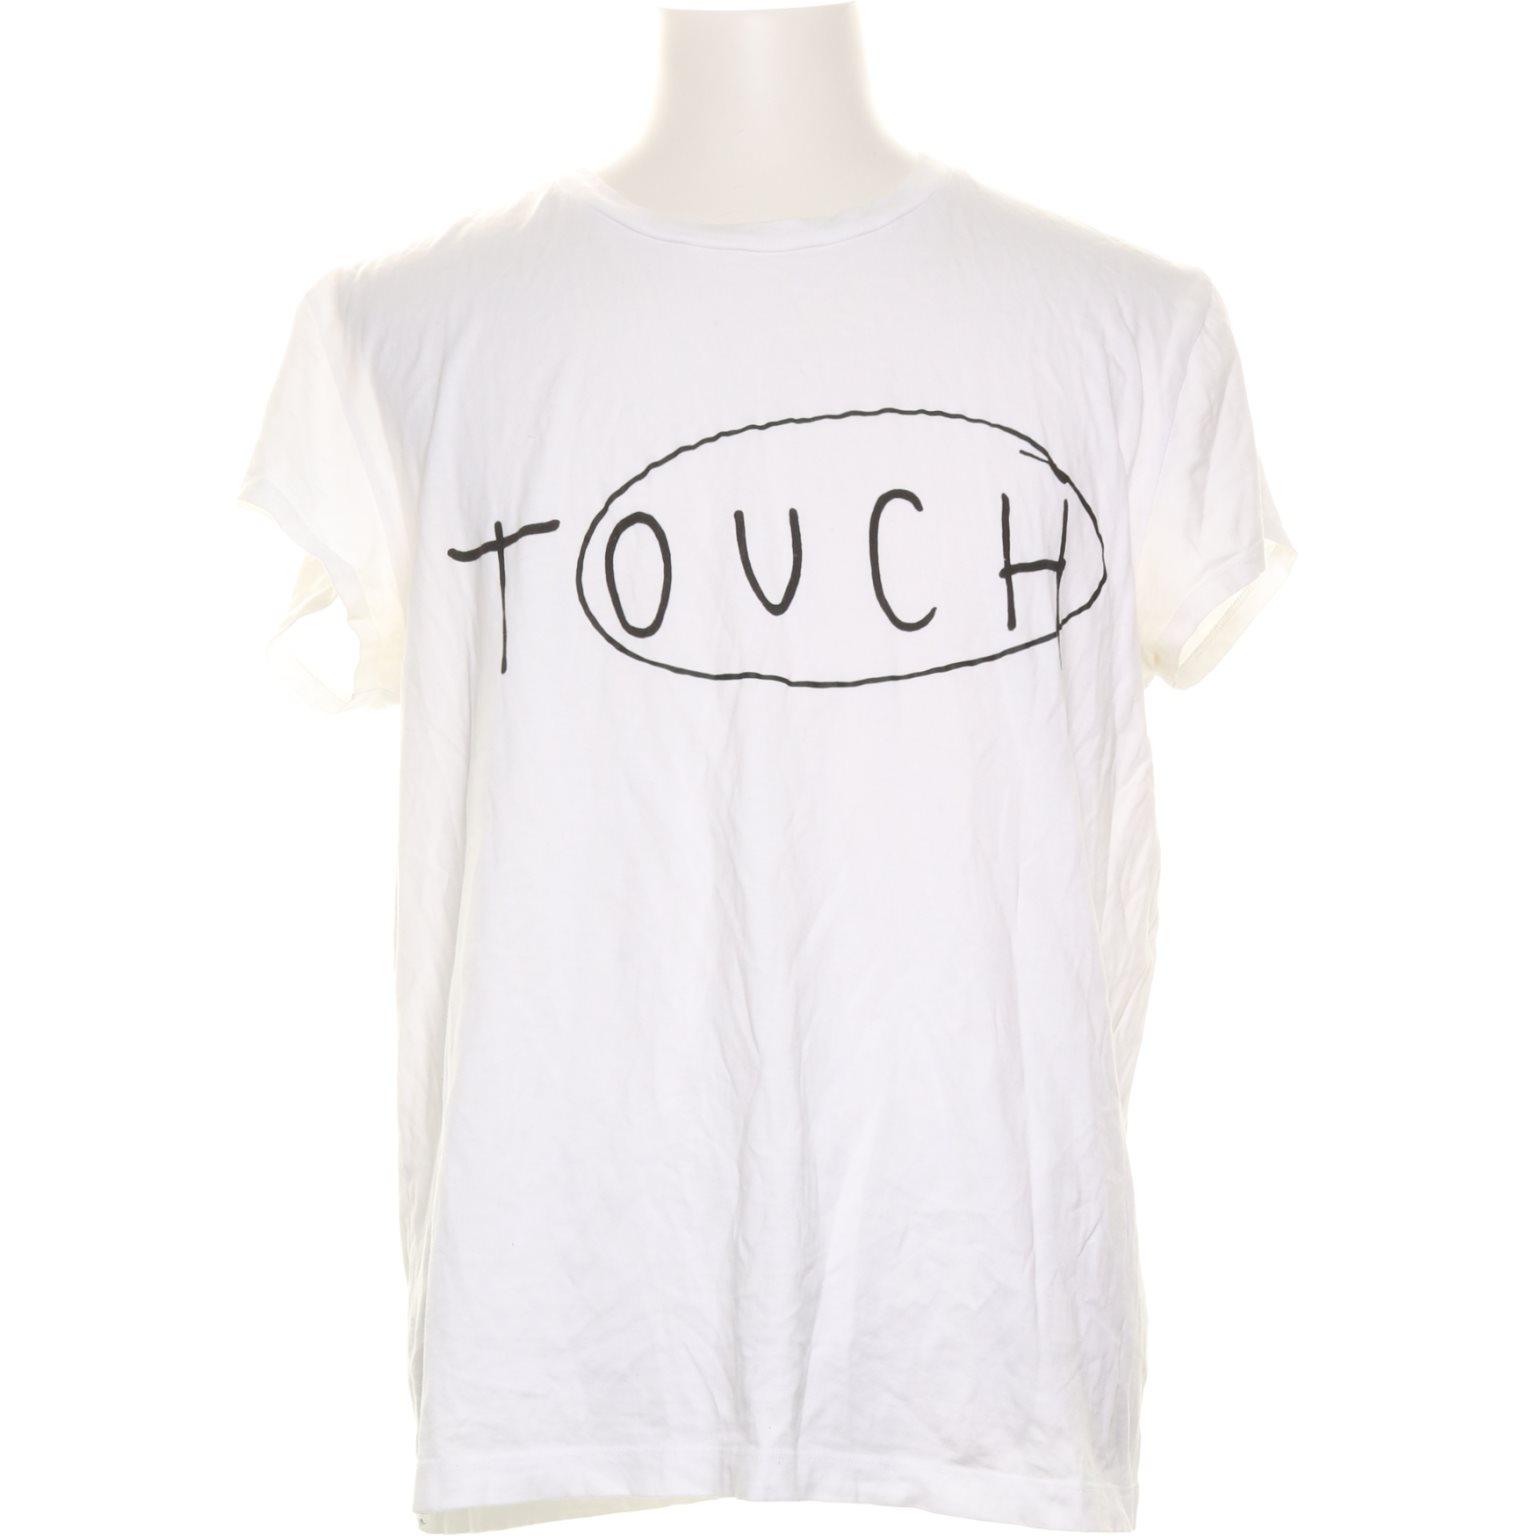 Acne Studios, T-shirt, Strl: L, Vit/Svart